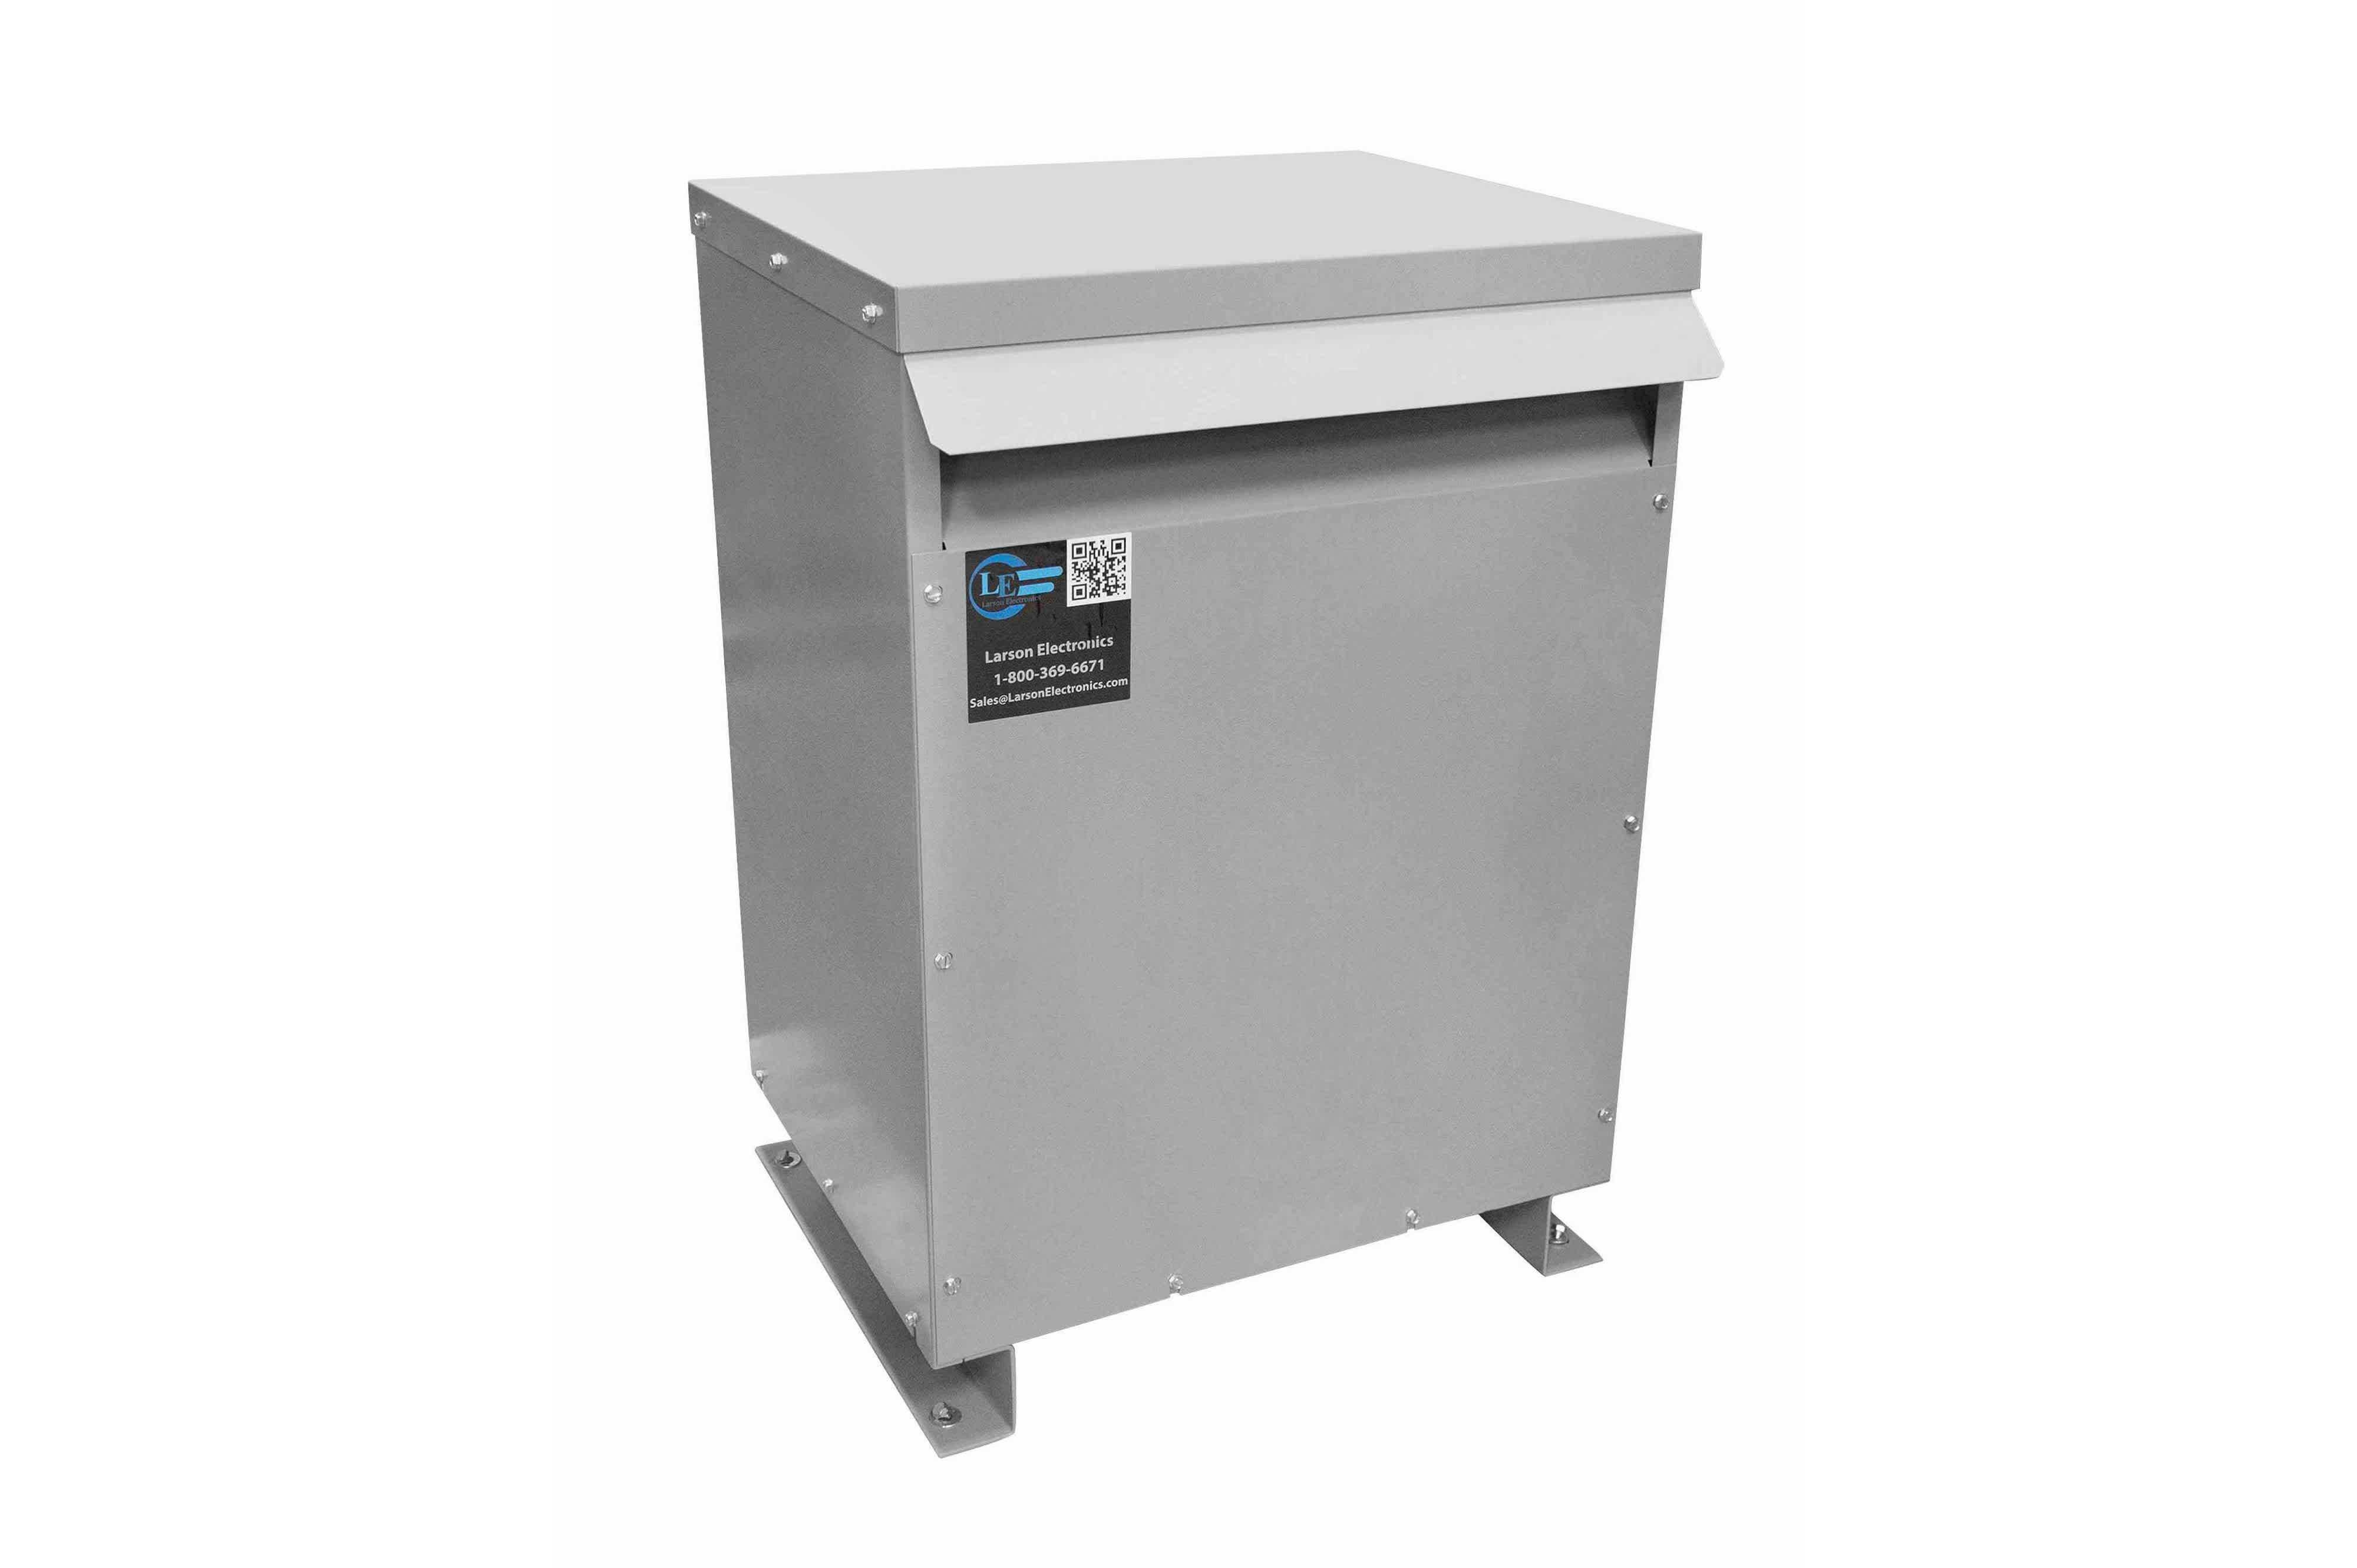 200 kVA 3PH Isolation Transformer, 240V Wye Primary, 480V Delta Secondary, N3R, Ventilated, 60 Hz